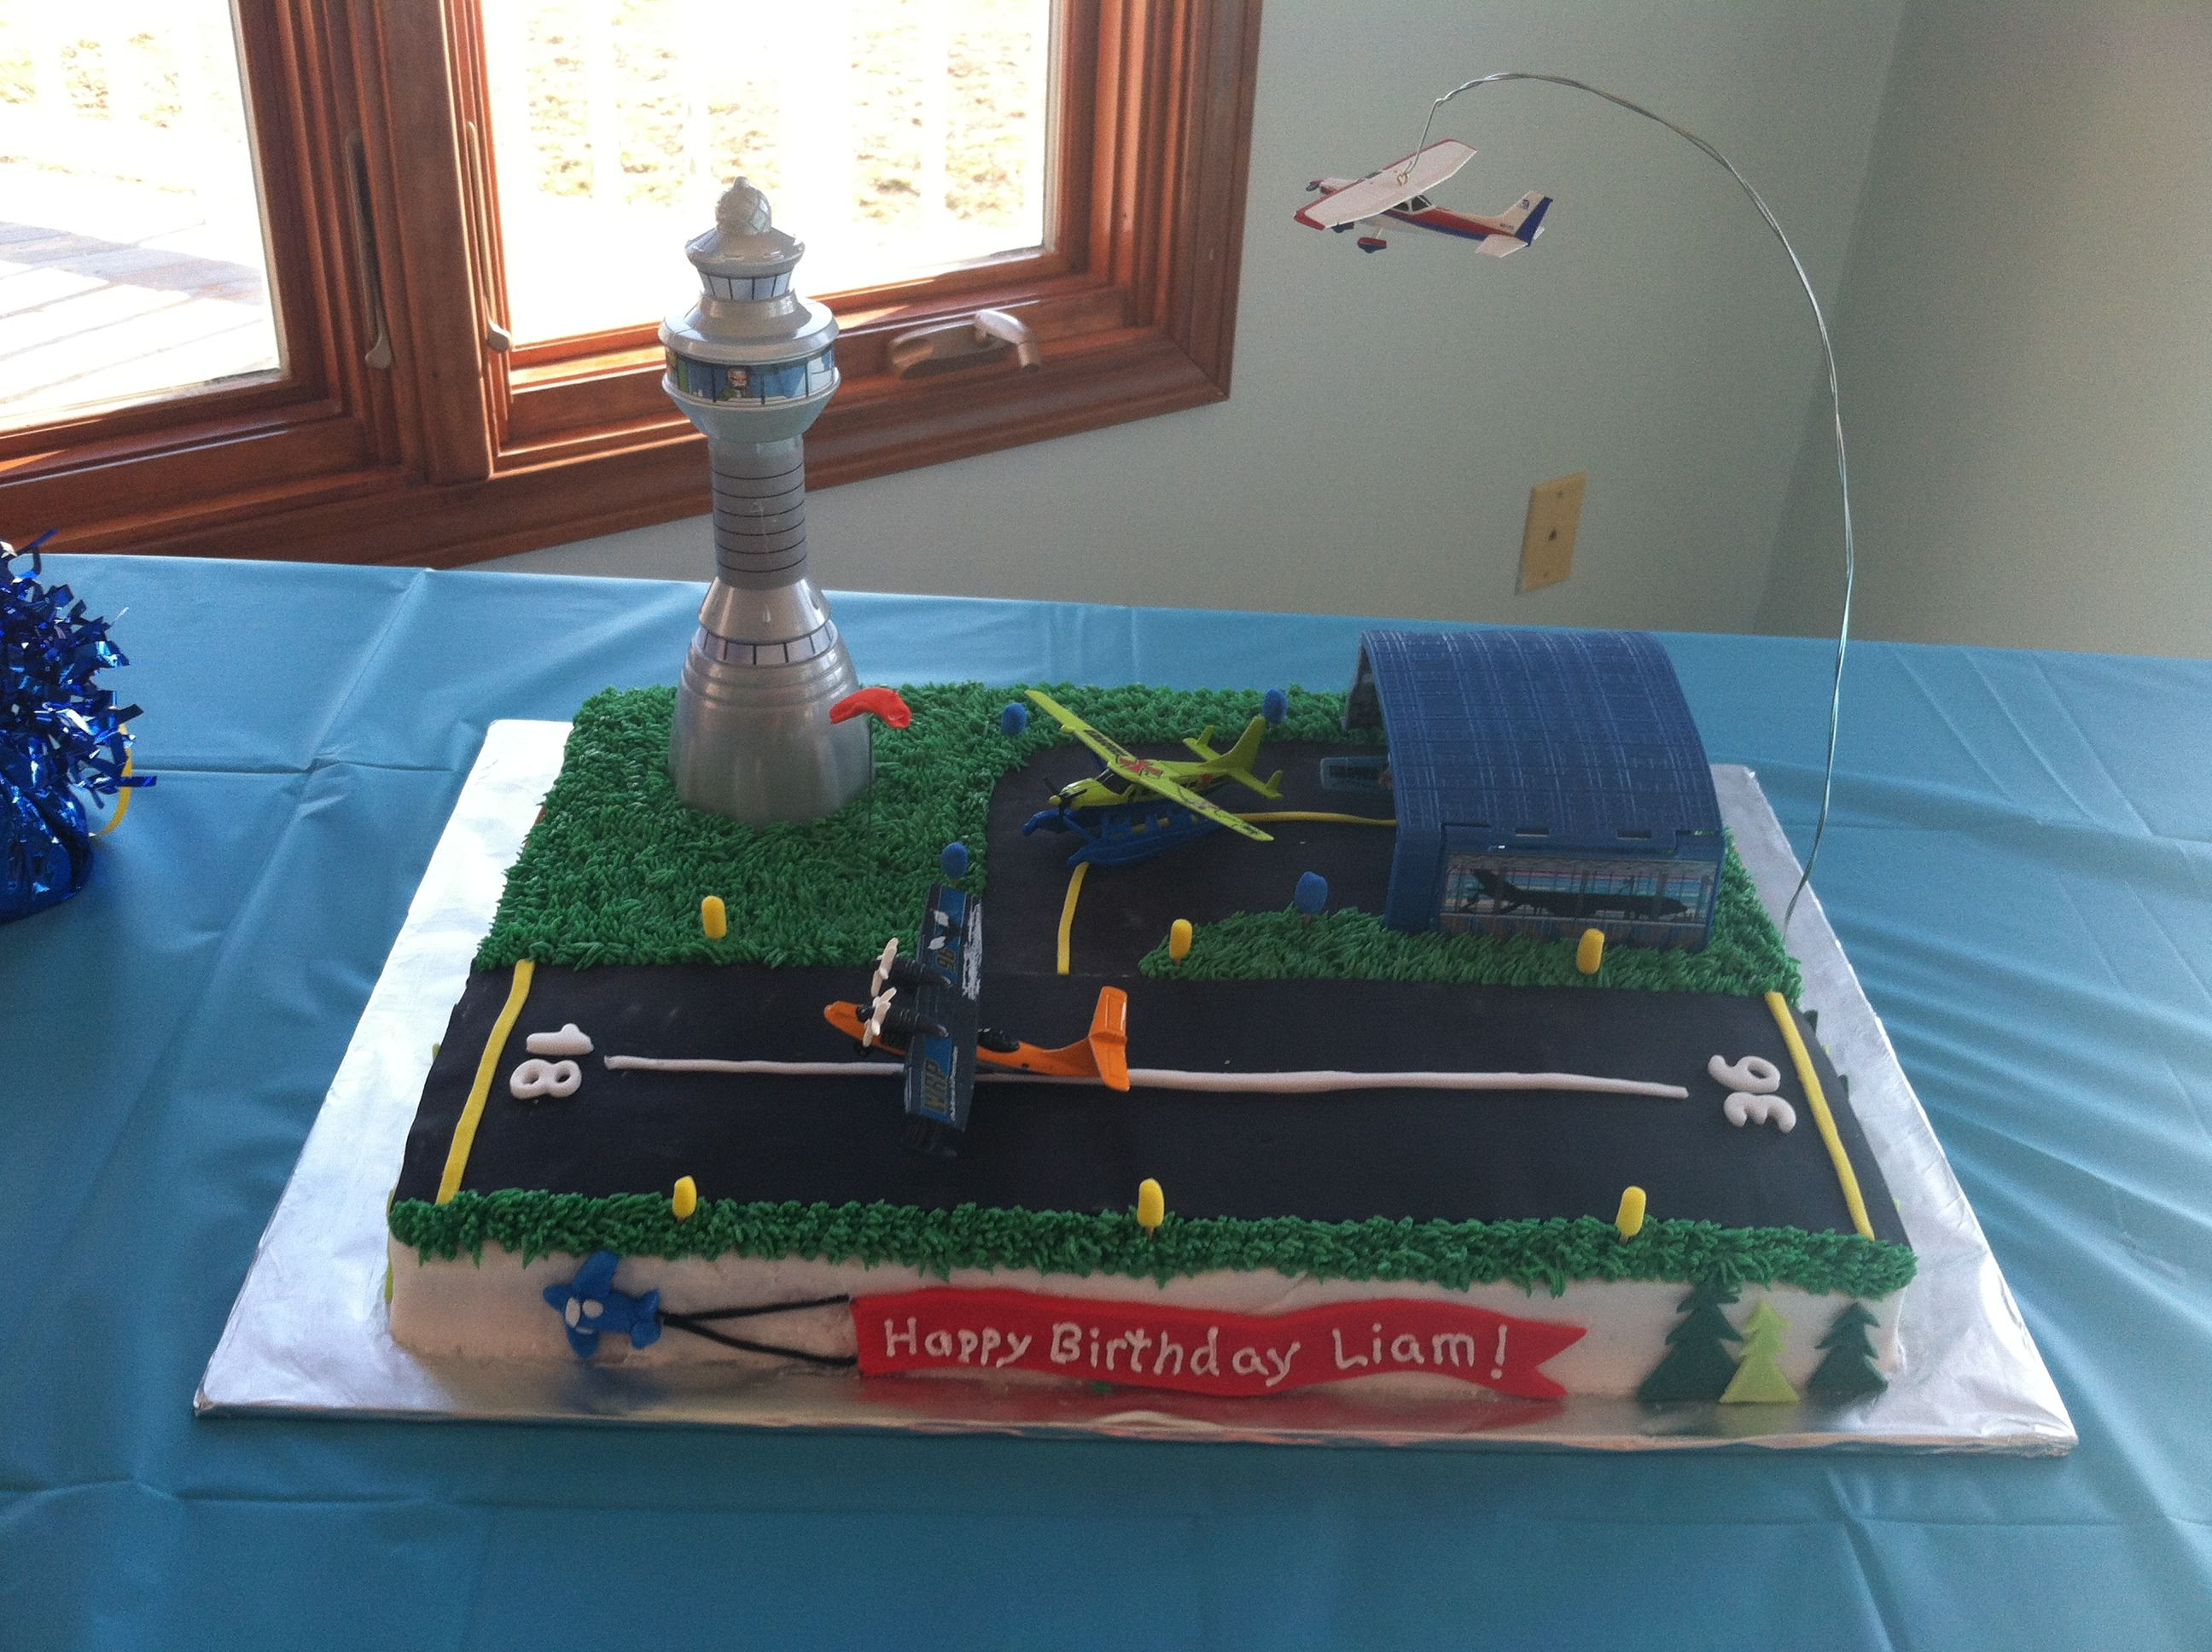 Airport Birthday Cake Cakes Pinterest Birthday Cakes Birthday